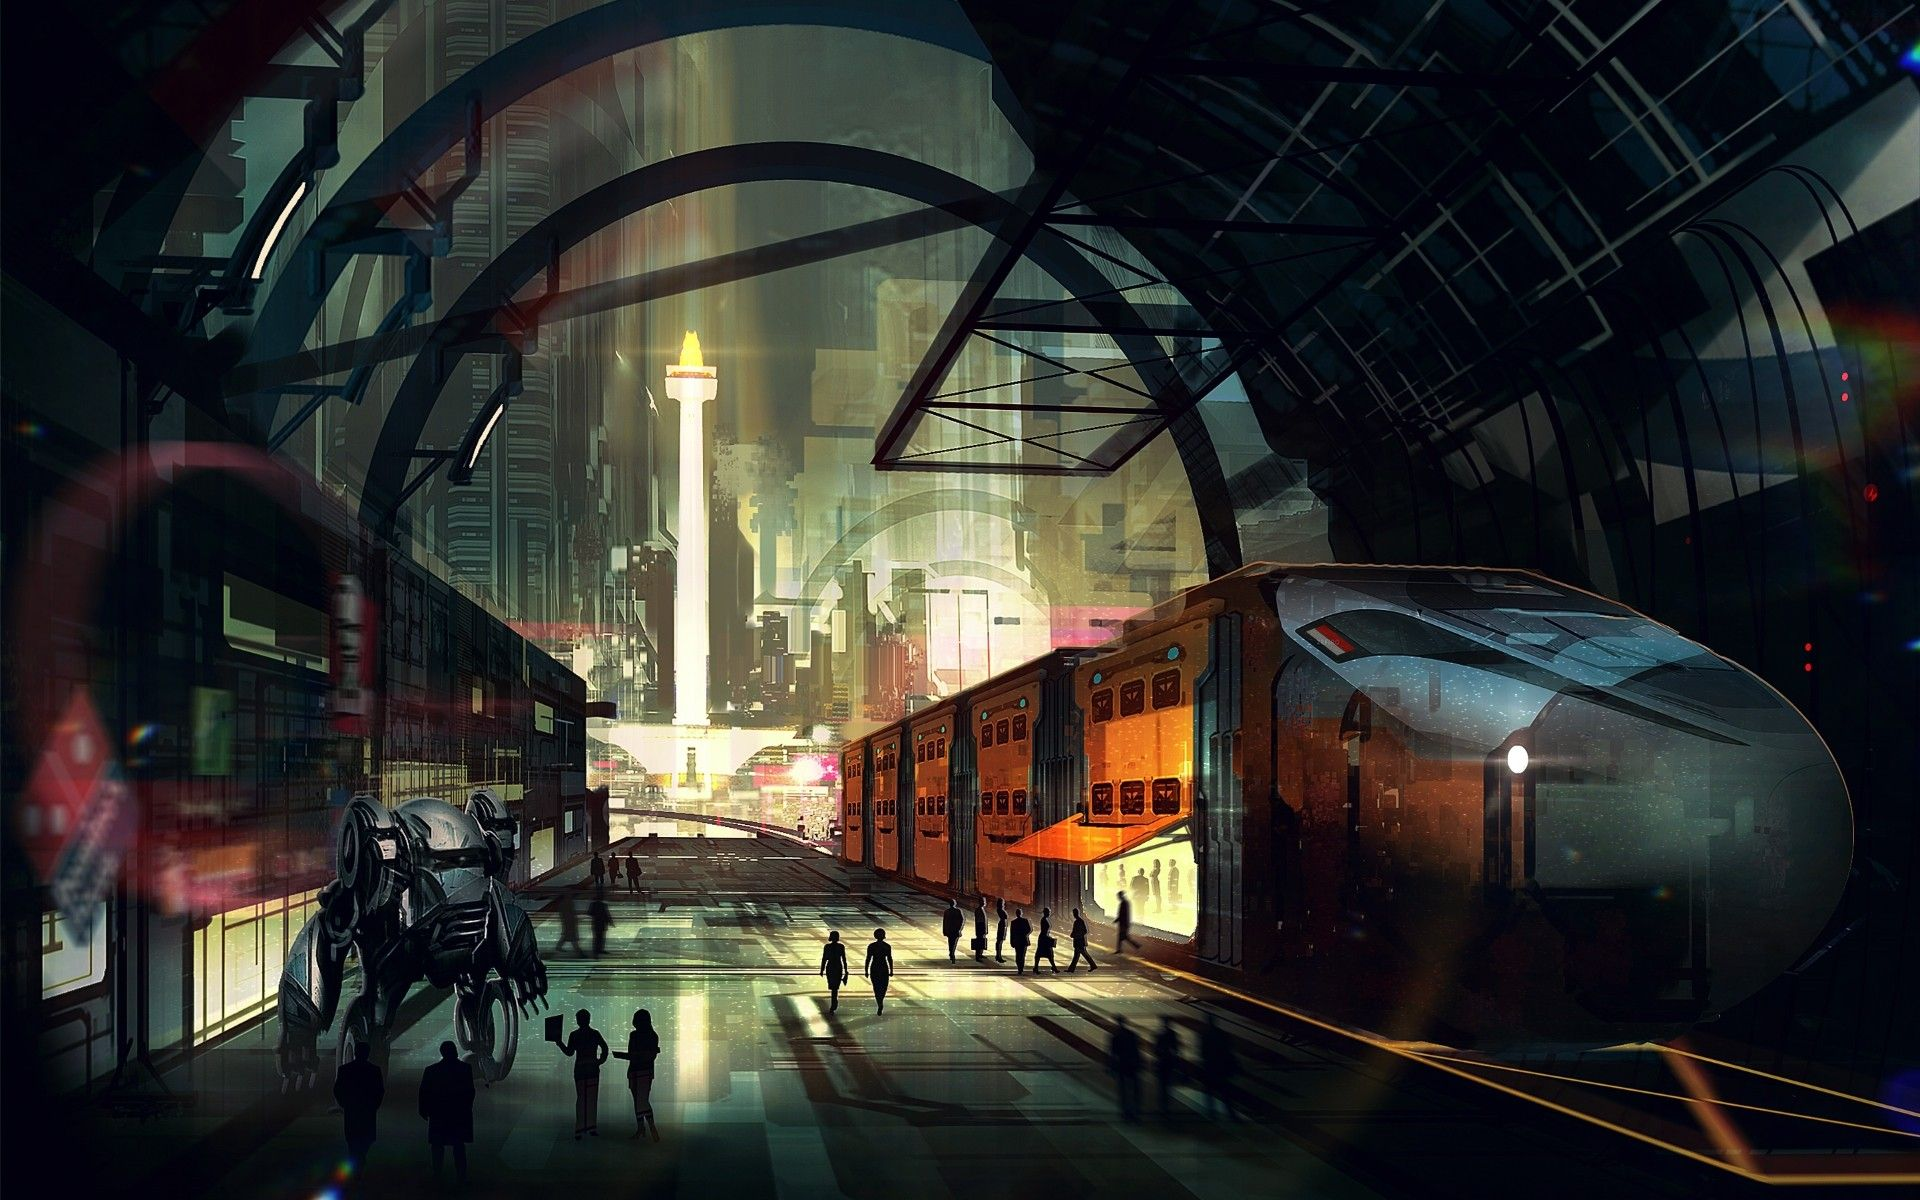 General 1920x1200 train railway train station sunlight digital art ...